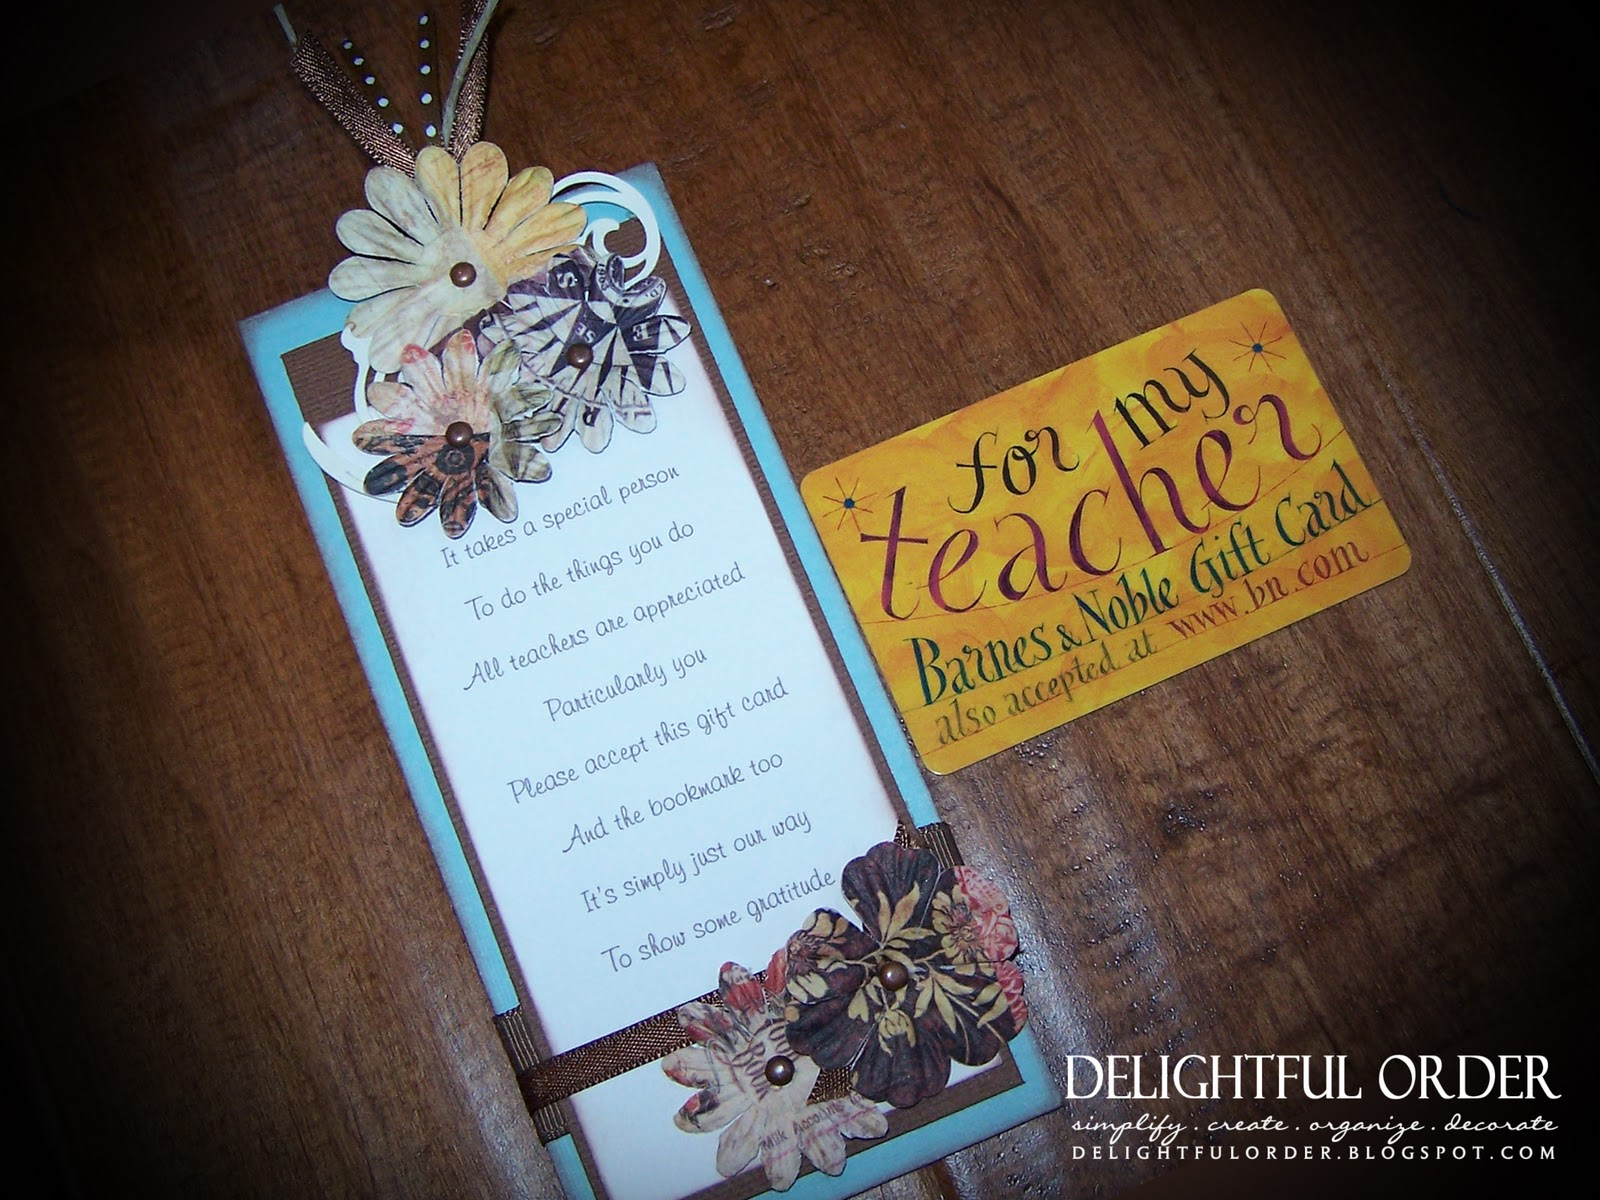 Delightful Order Teacher Gift Idea Bookmark Pencil Holder Teachherpleaseblogspotcom And If You Wanted Can Change To Leader Pastor Grandmas Etc